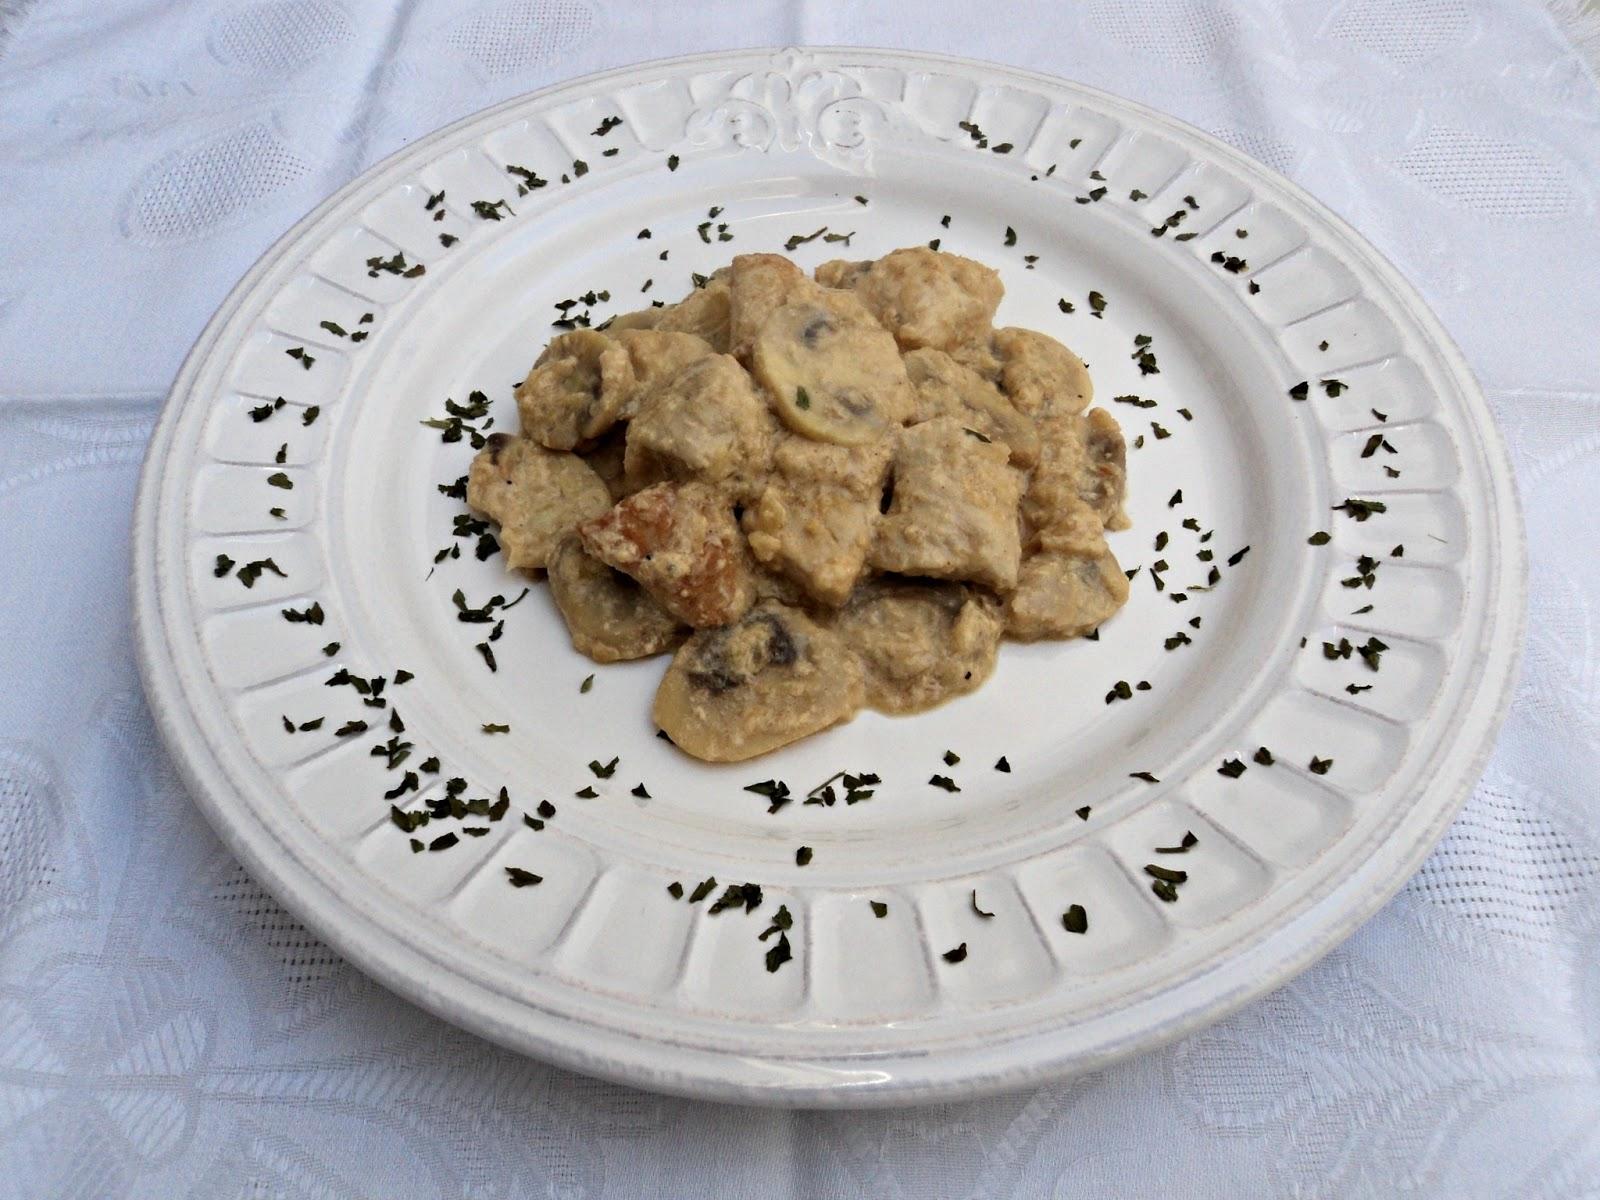 Pechugas de pollo - 7010 recetas caseras - Cookpad